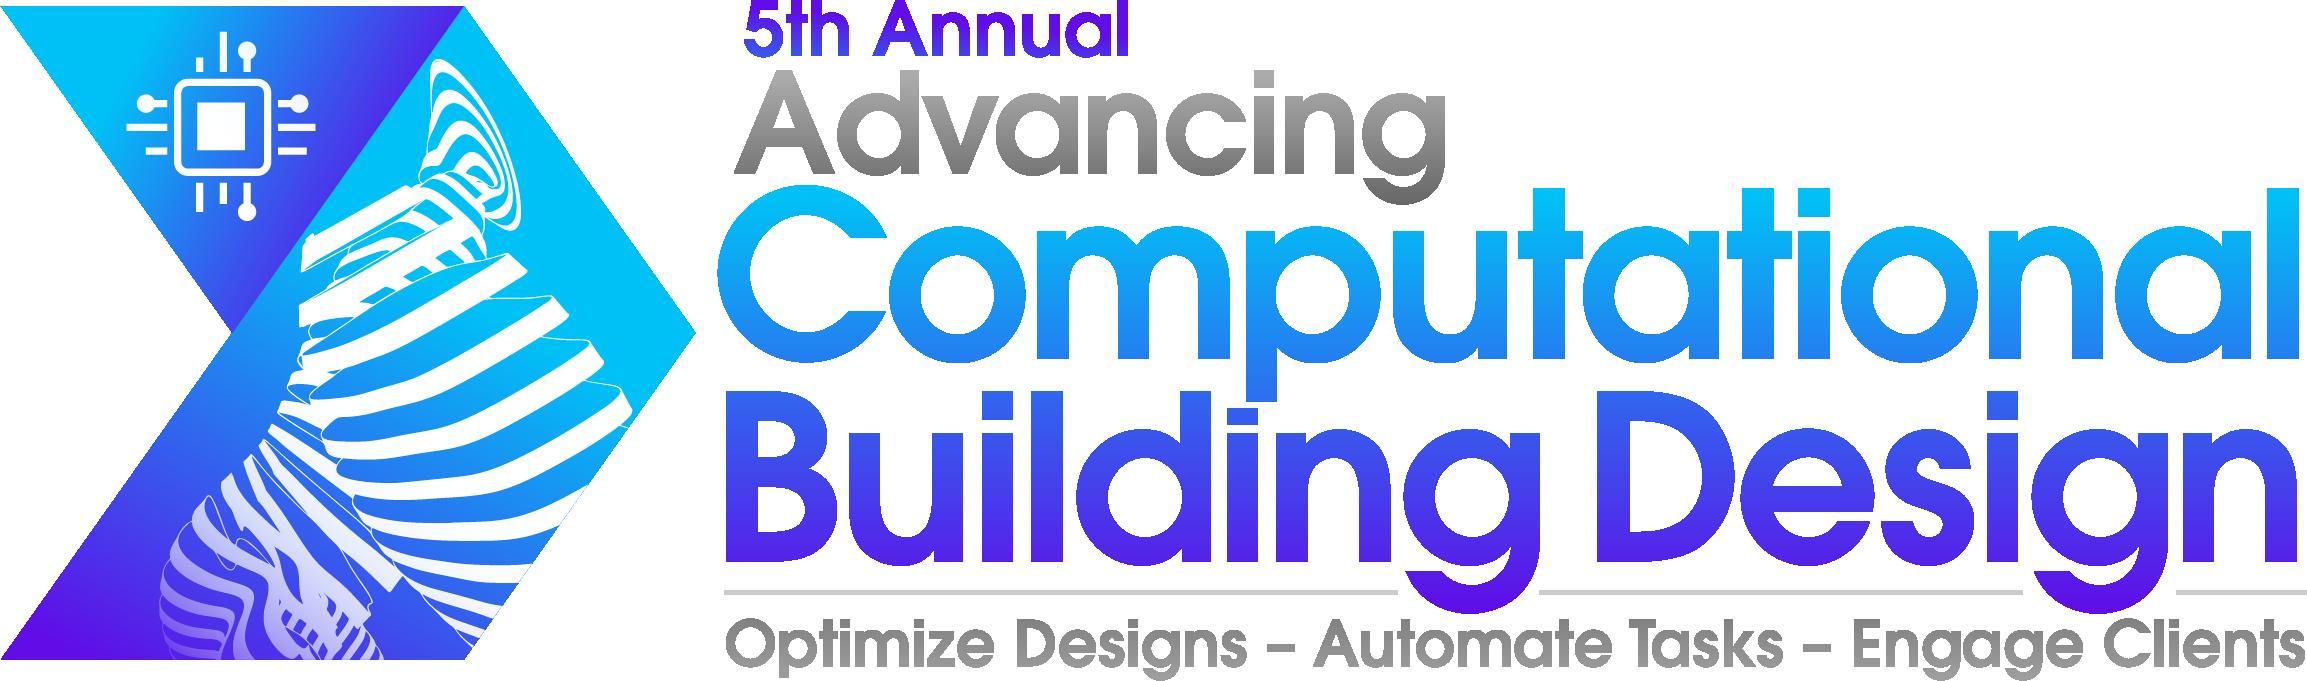 Advancing Computational Building Design 2021 logo